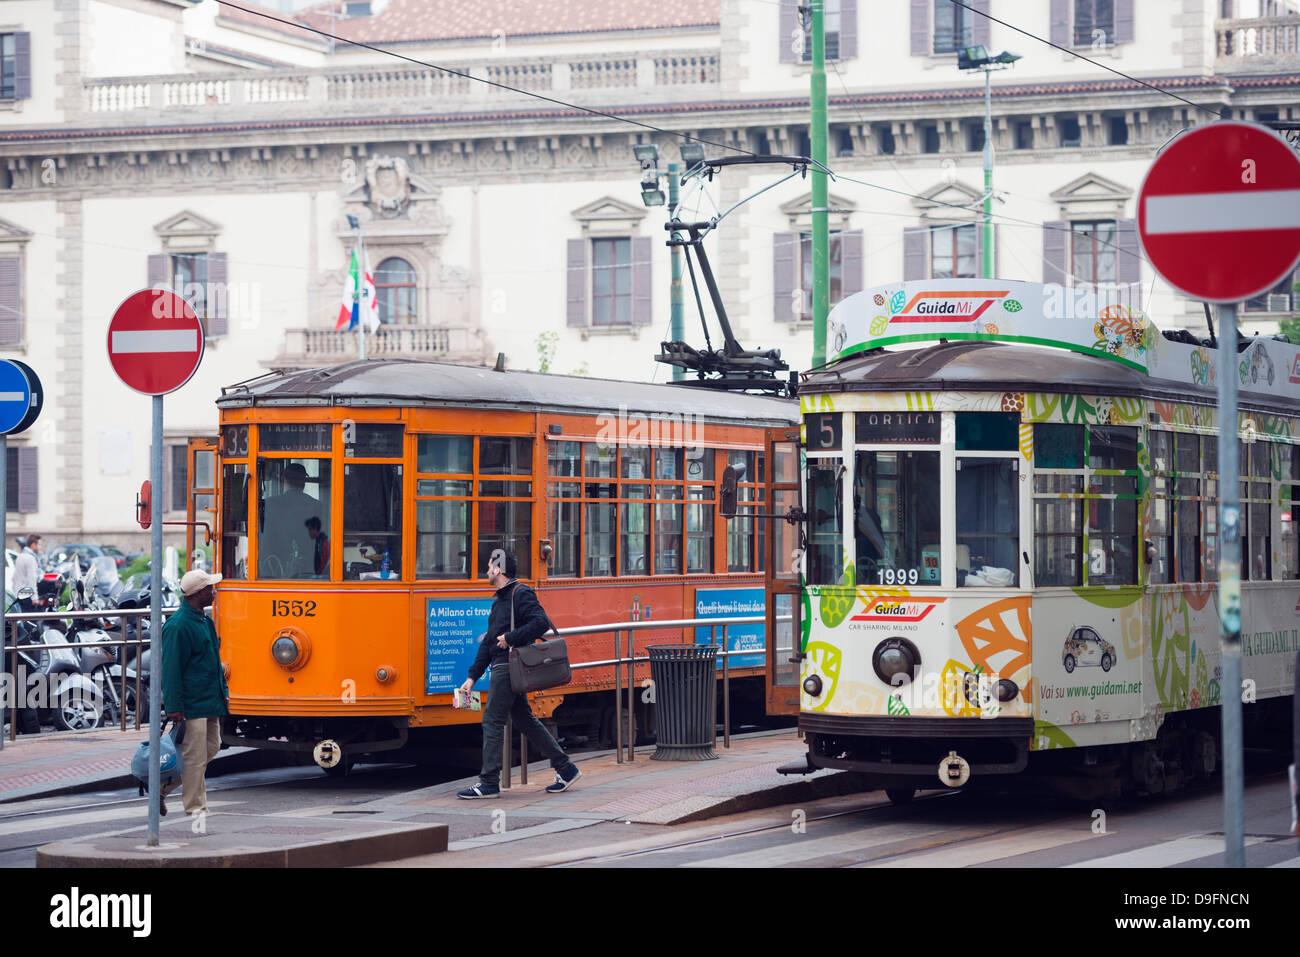 Le tramway de la ville, Milan, Lombardie, Italie Photo Stock